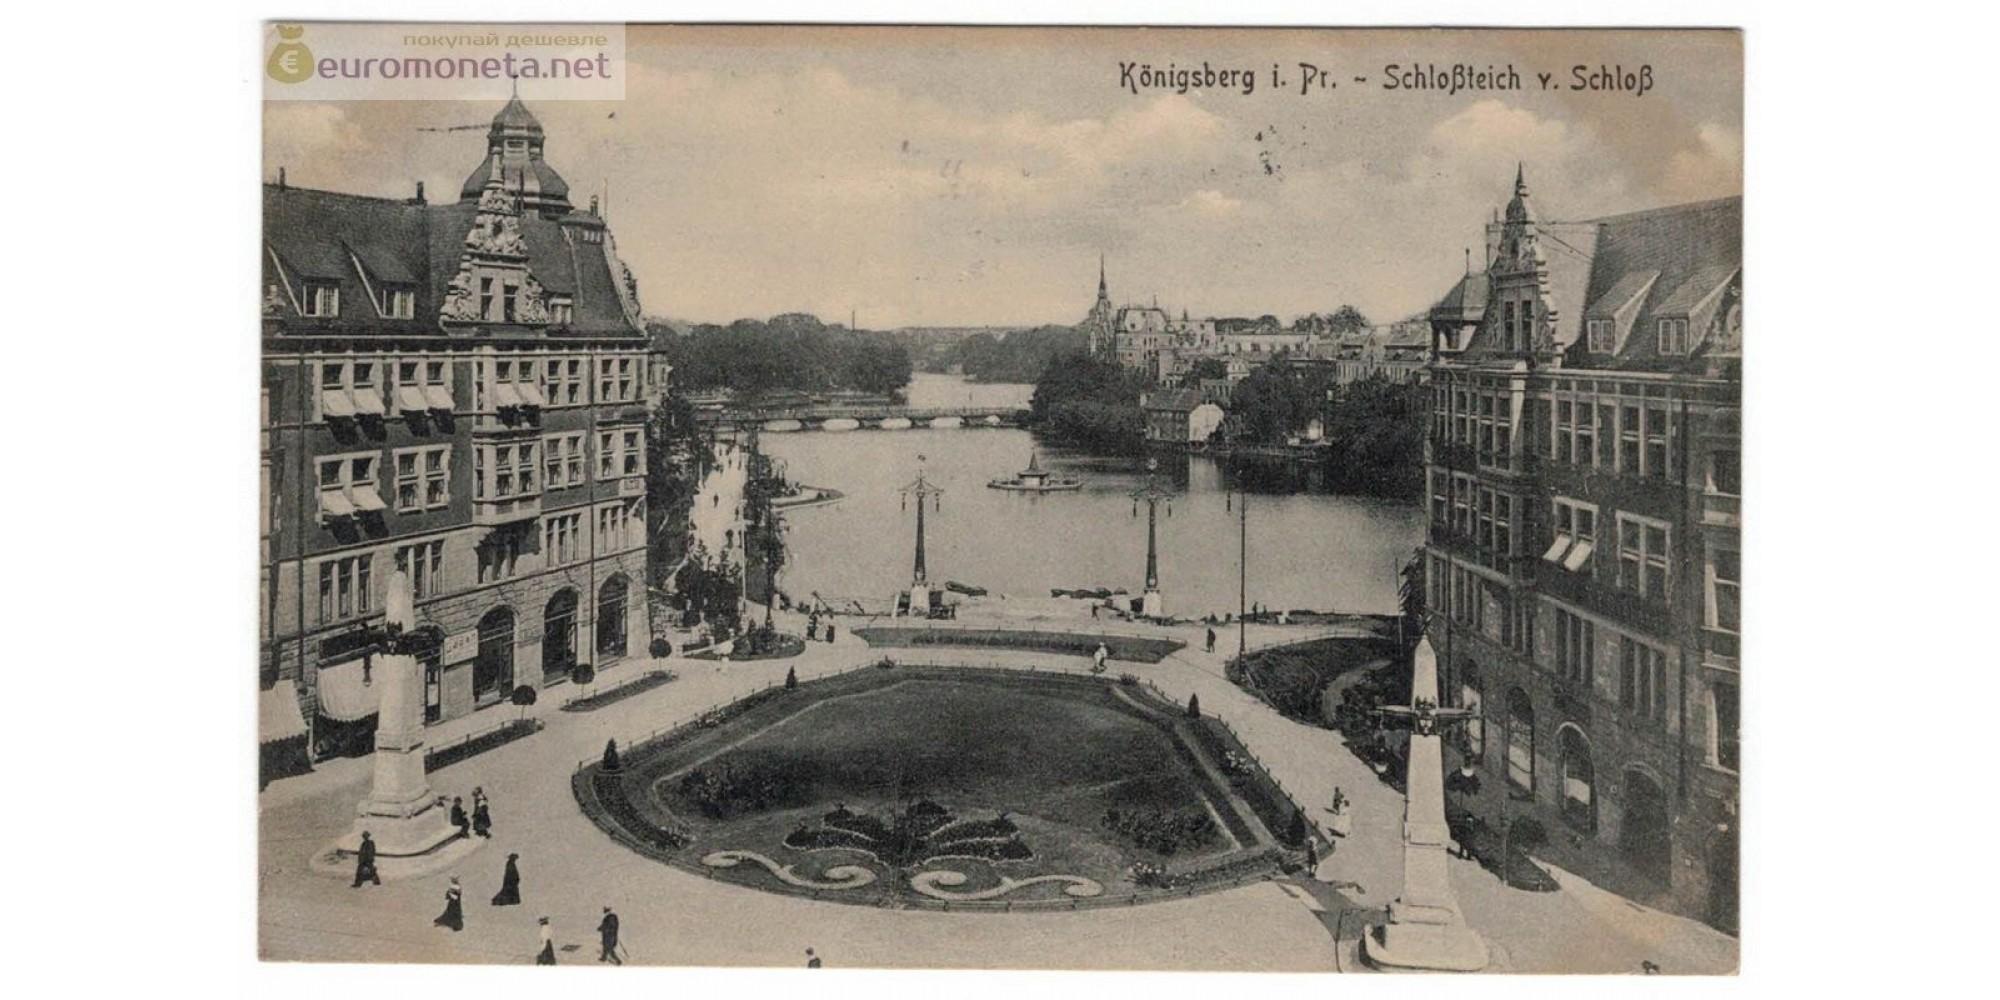 Открытка Пруссия Кёнигсберг Kenigsberg площадь замка озеро